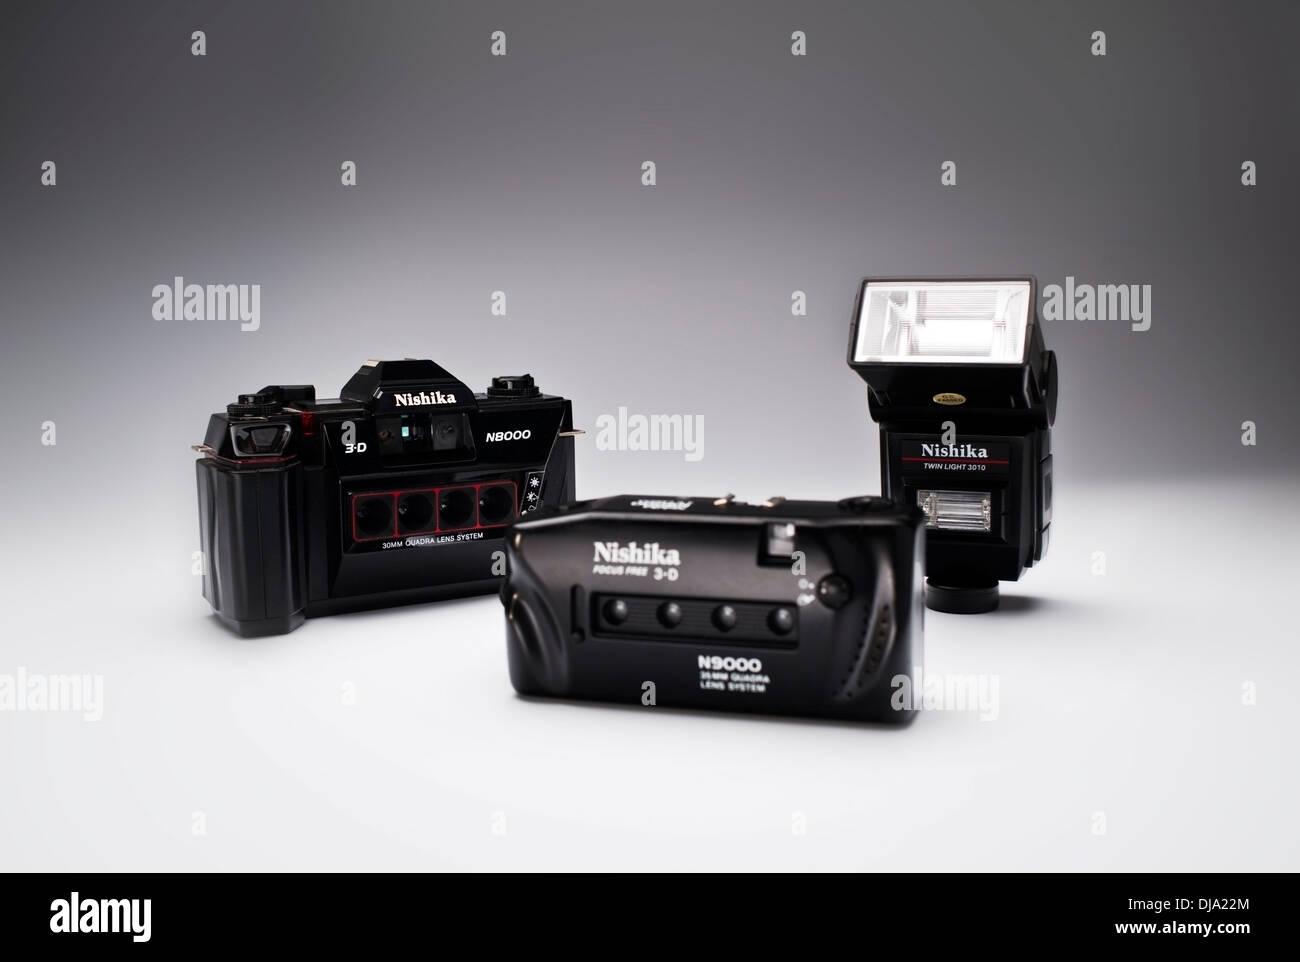 Vintage Nishika 35mm film 3-D Cameras and flash - Stock Image